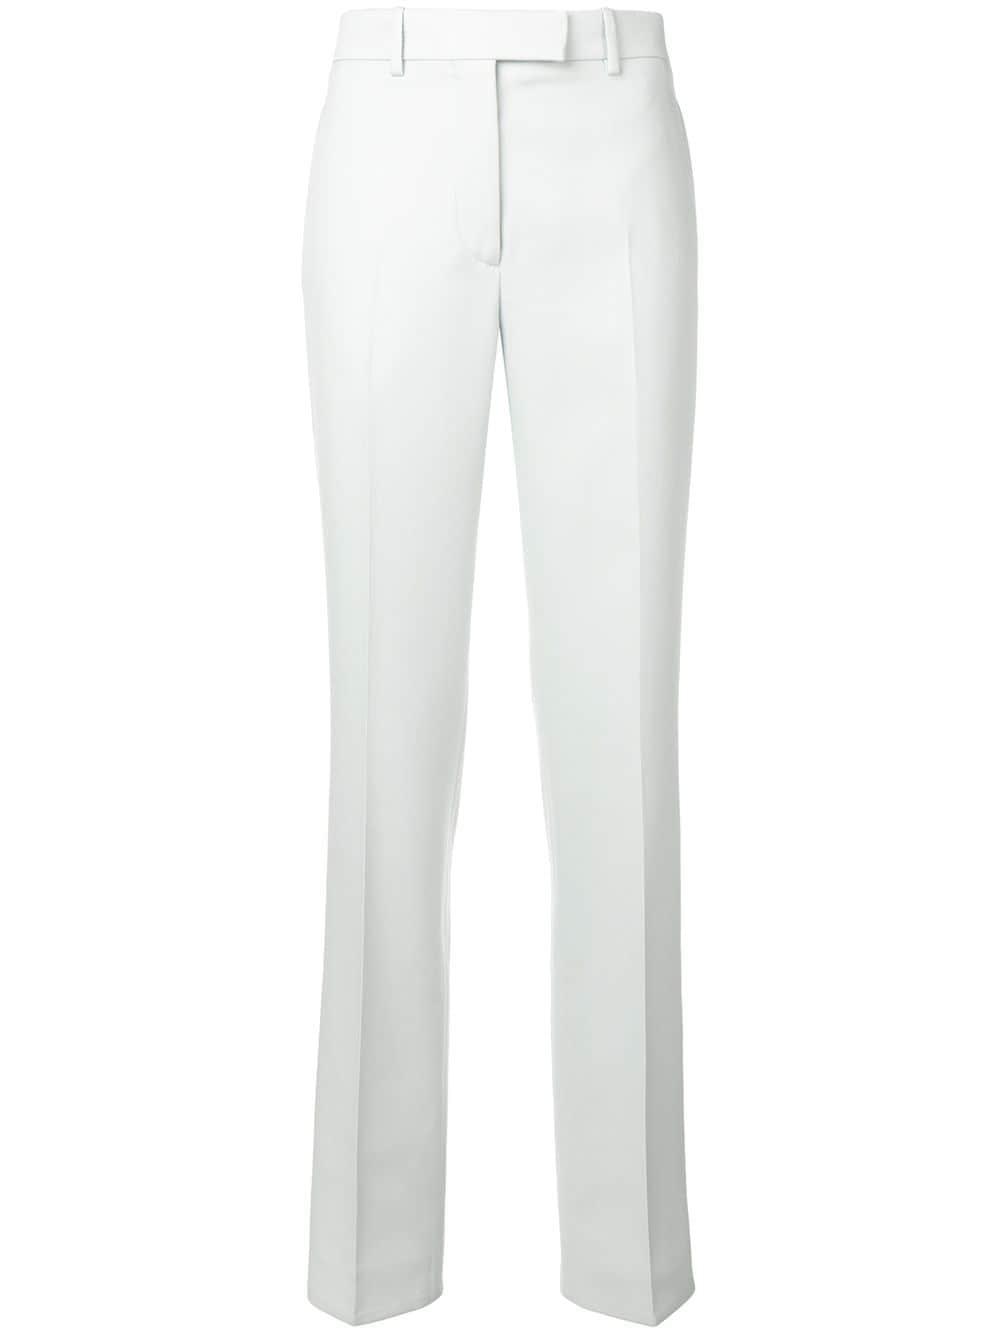 d10c0256f87 Calvin Klein 205W39nyc high waisted trousers - Blue - Glami.cz